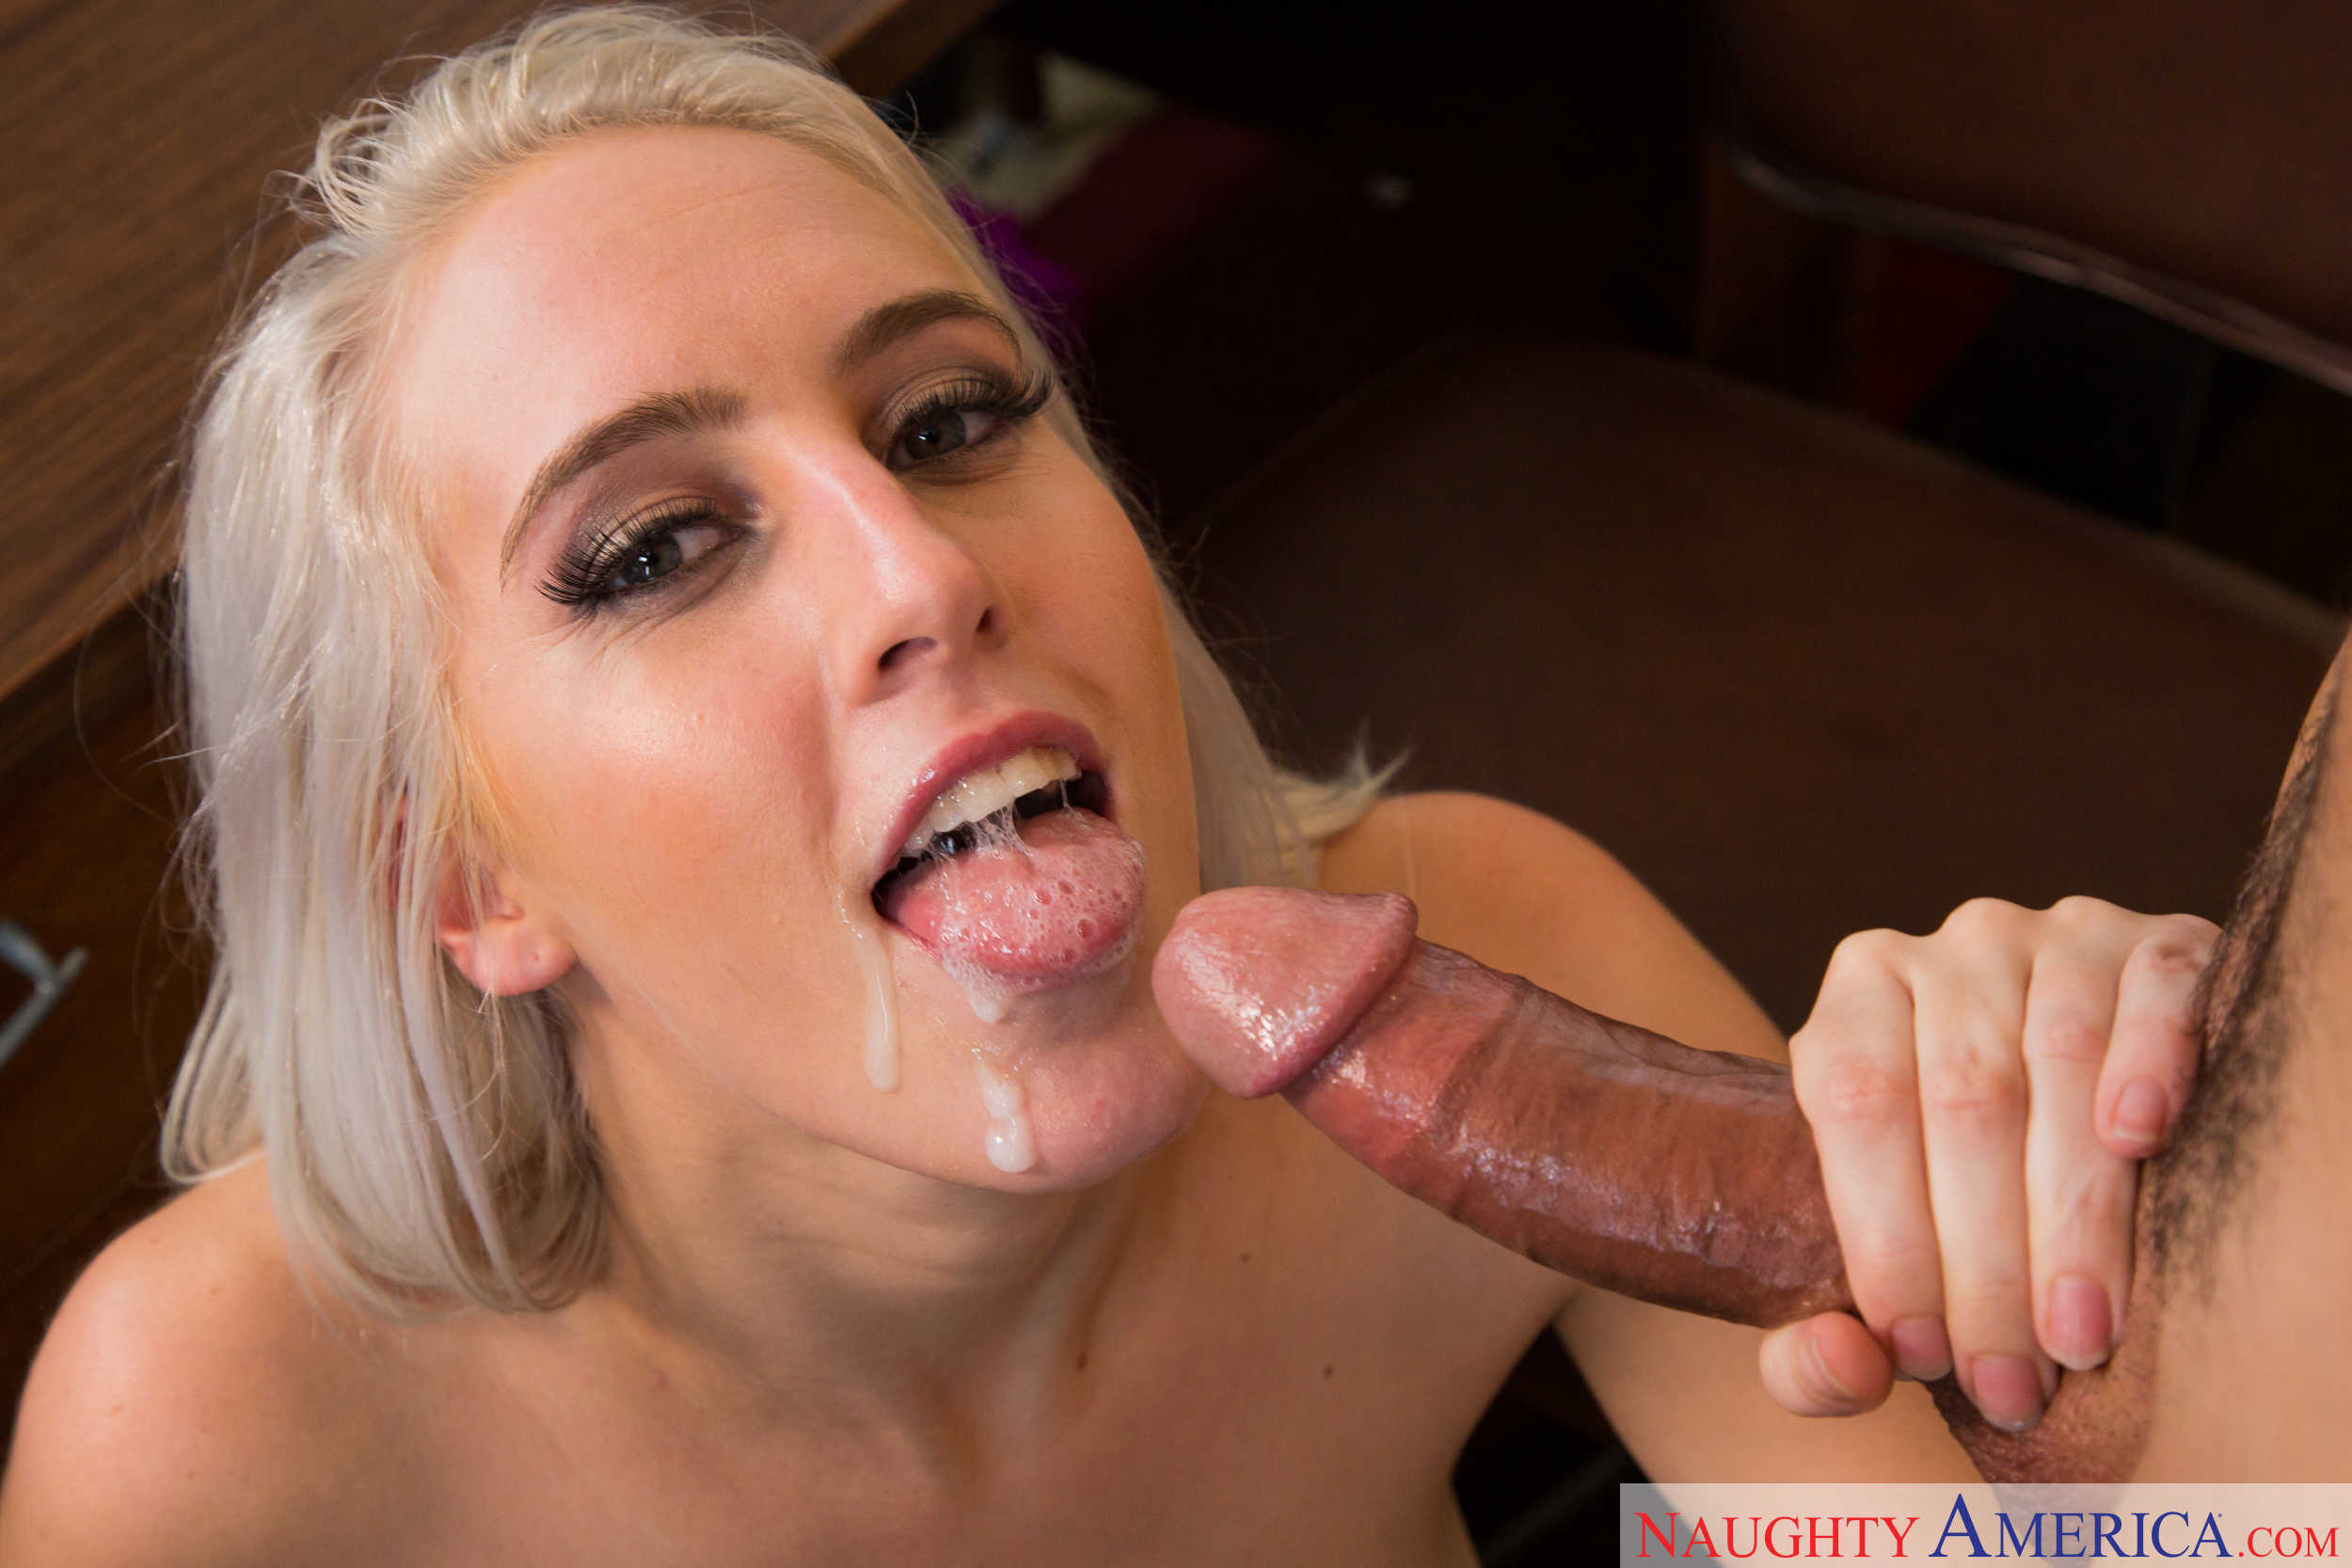 Wankz hot blonde and huge stubby cock - 5 5